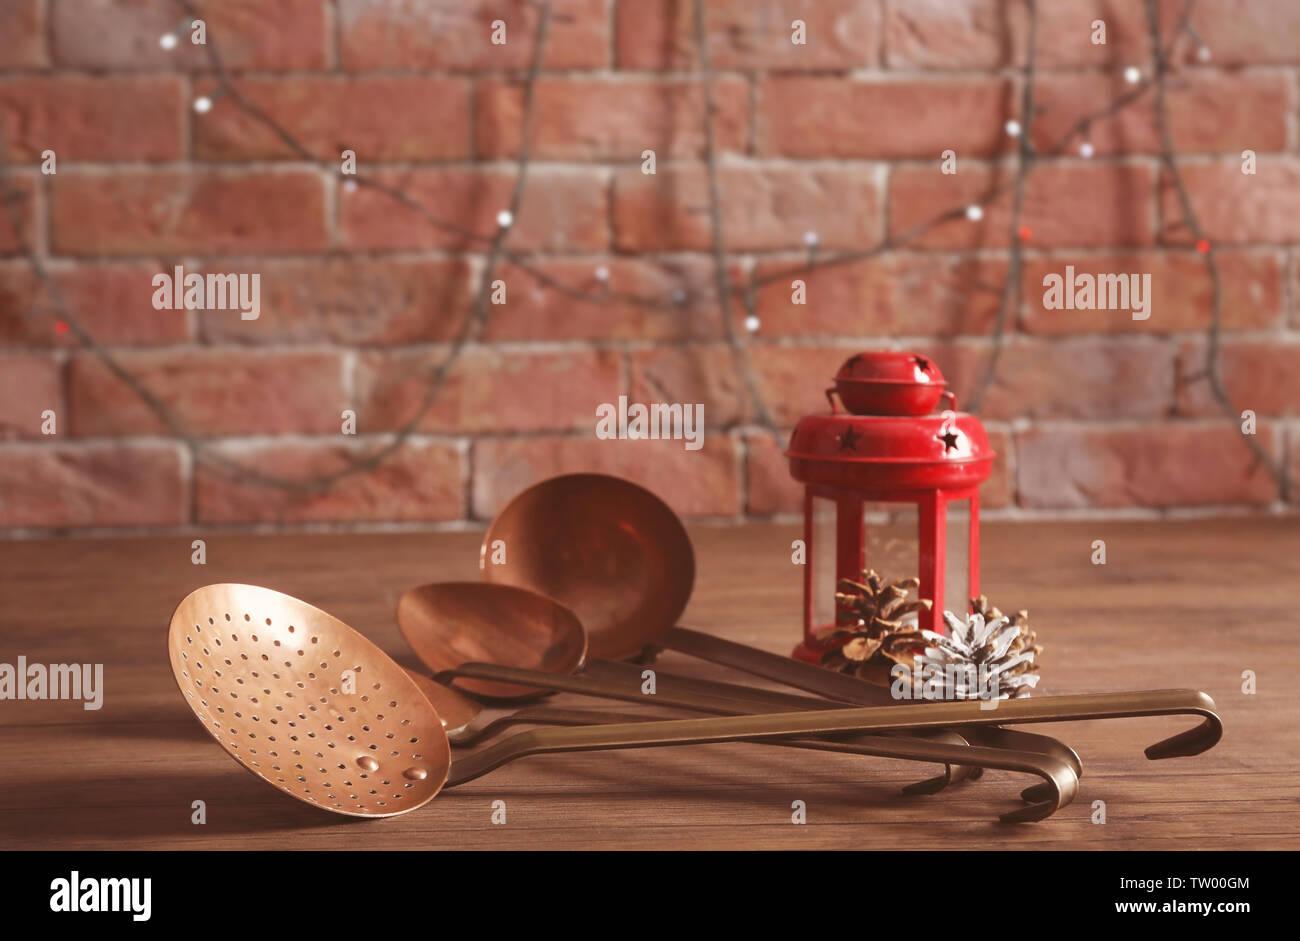 Set of metal kitchen utensils on wooden table - Stock Image